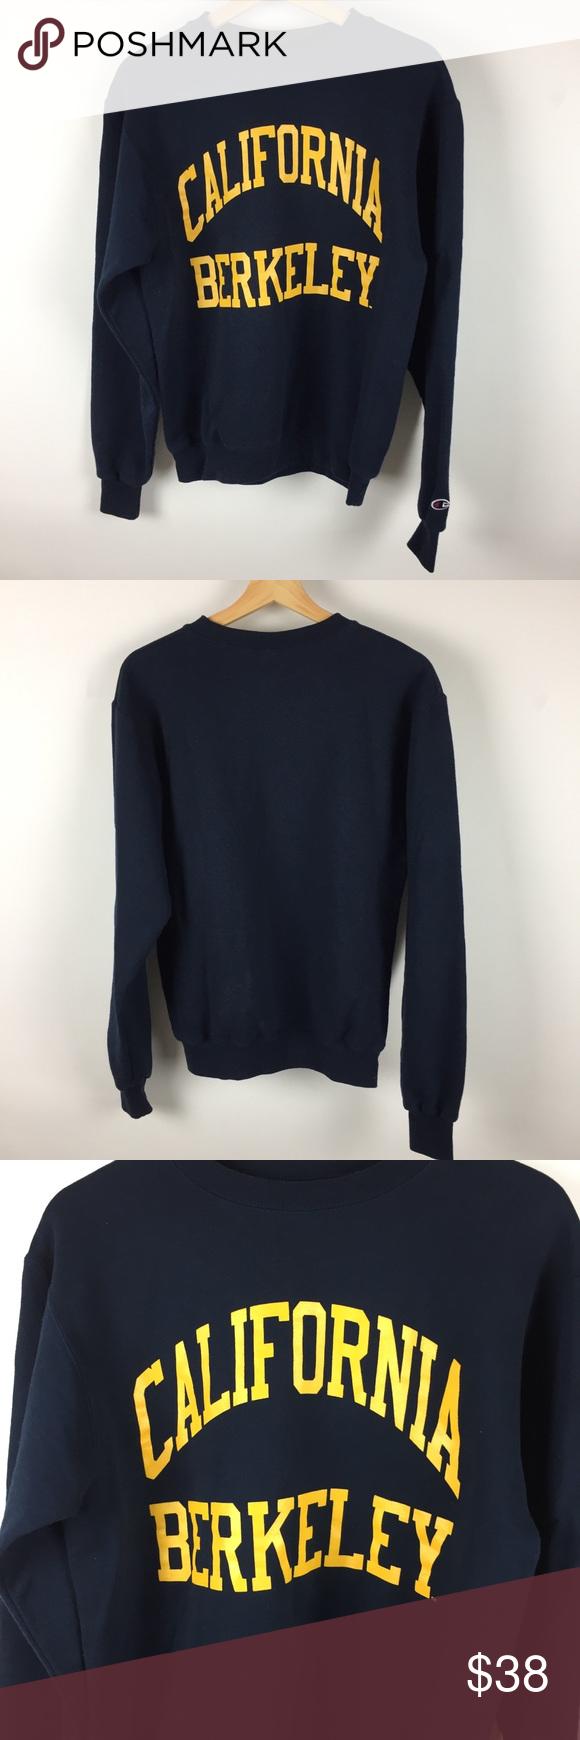 California Berkeley Champion Eco Fleece Sweatshirt Sweatshirts Sweatshirt Fleece Sweatshirt Tops [ 1740 x 580 Pixel ]